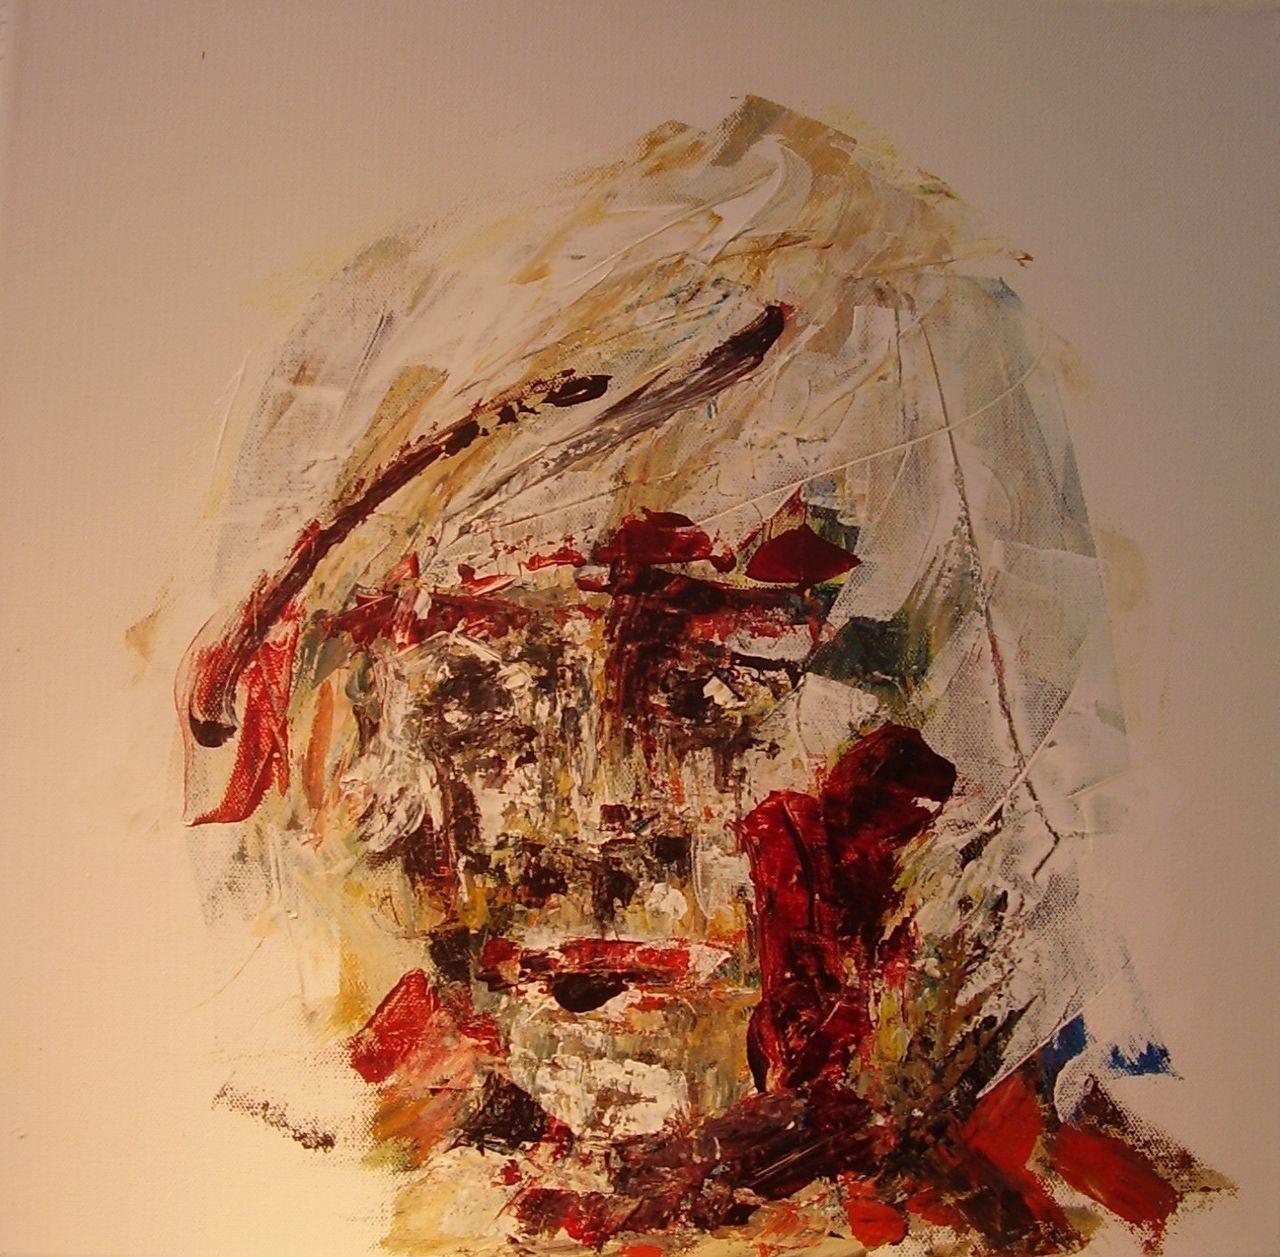 Bild: Malerei, Kopf, Abstrakt von Horst Röttger bei KunstNet